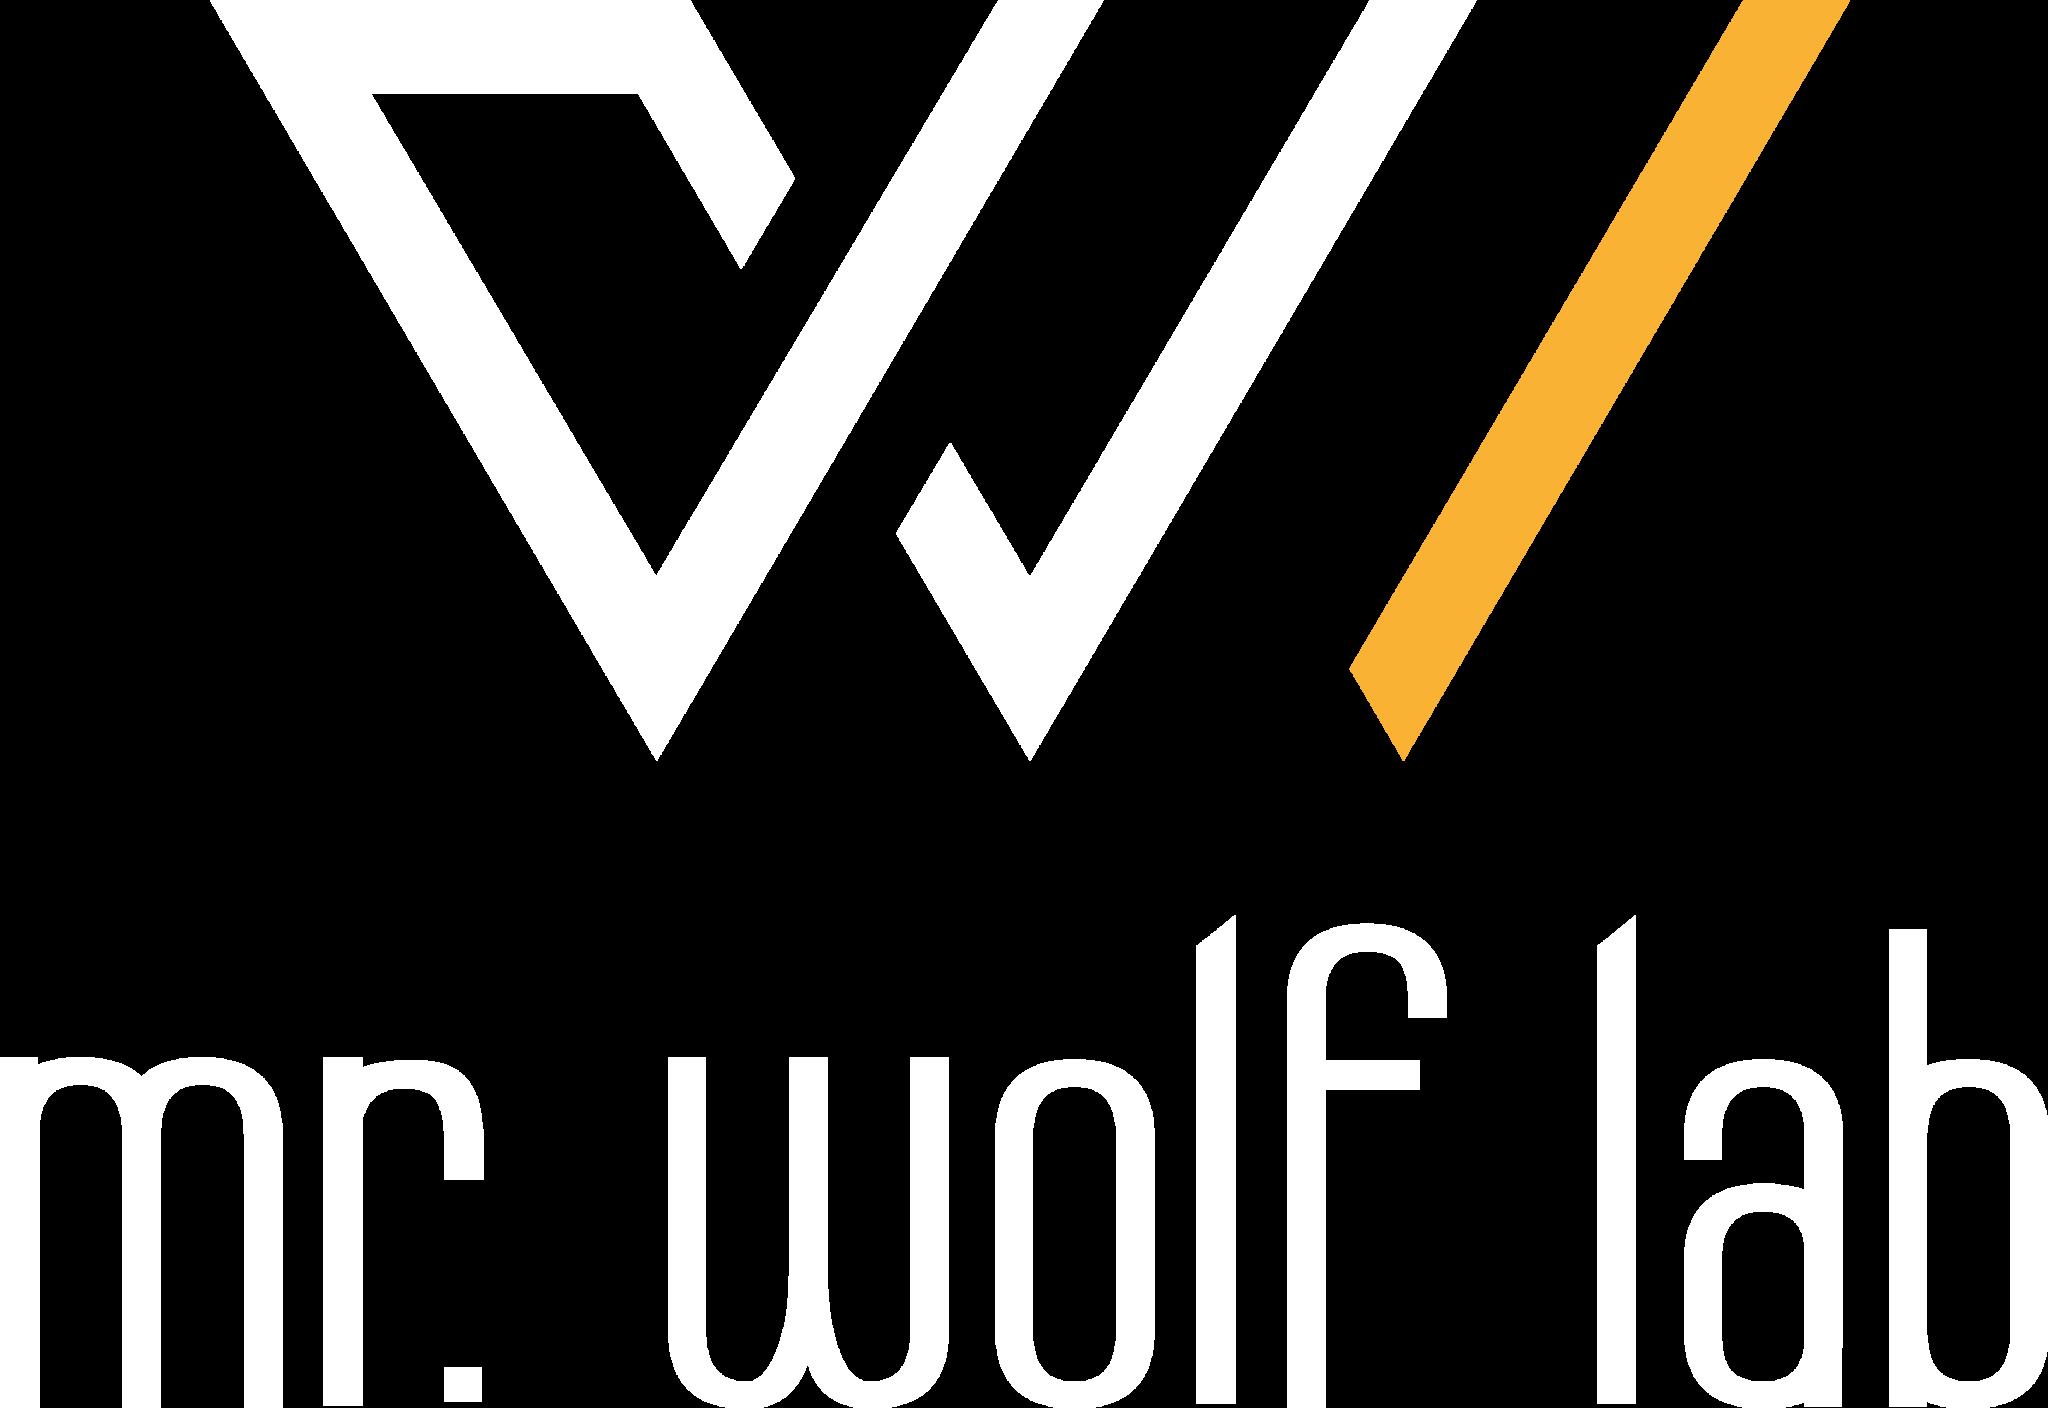 studio grafico mr wolf lab fonte nuova